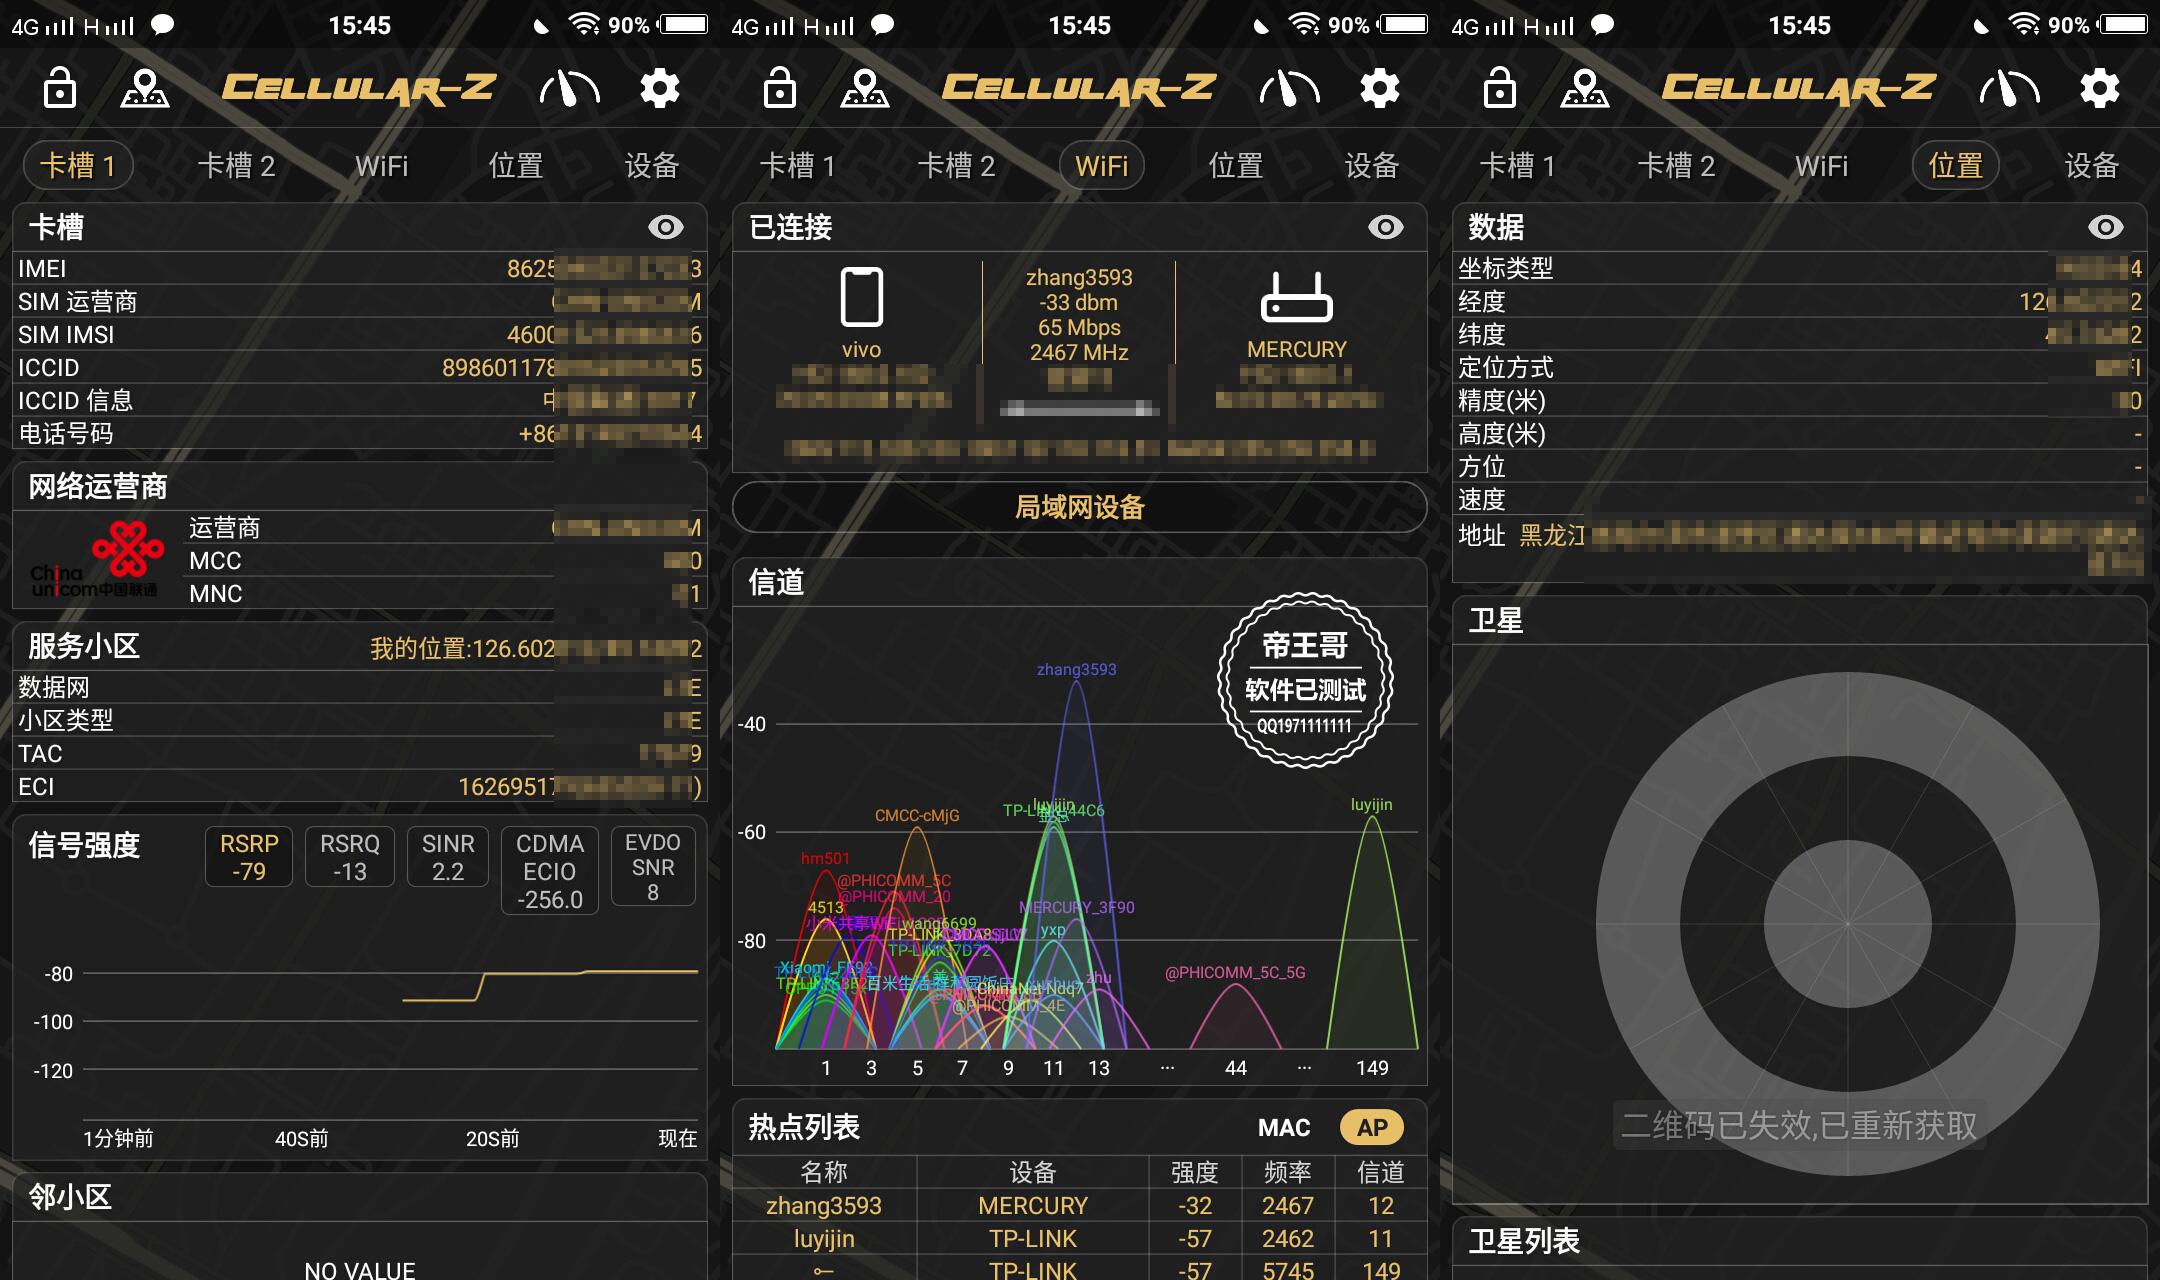 Cellular-Z_v5.1 网络详细状态检测/卫星查看